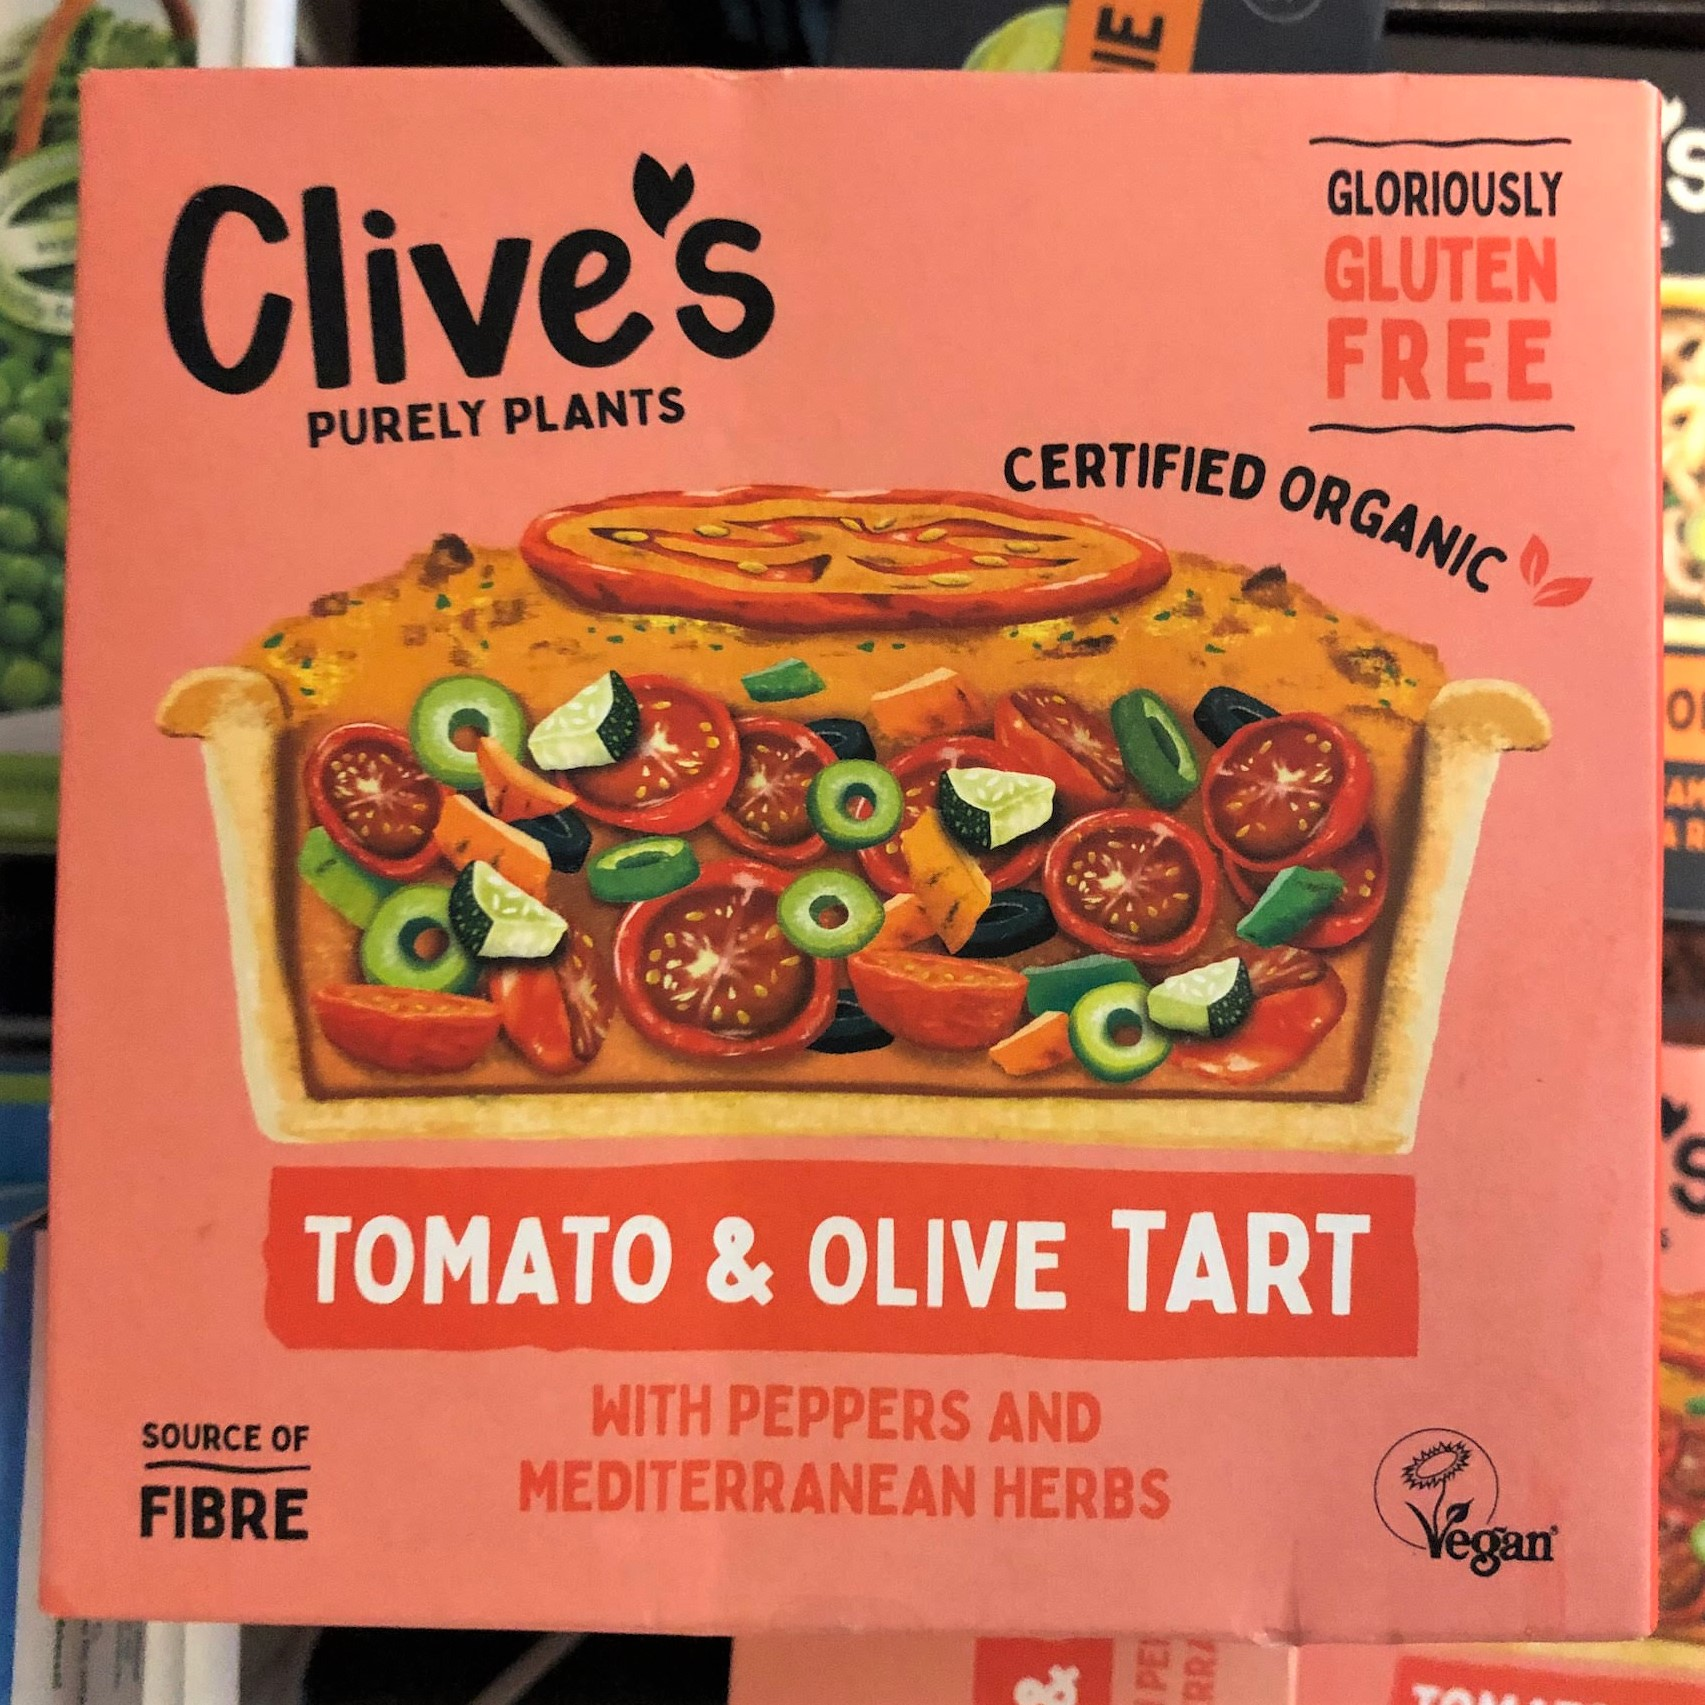 Clive's Pies & Tart (Gluten Free, Organic, Vegan)